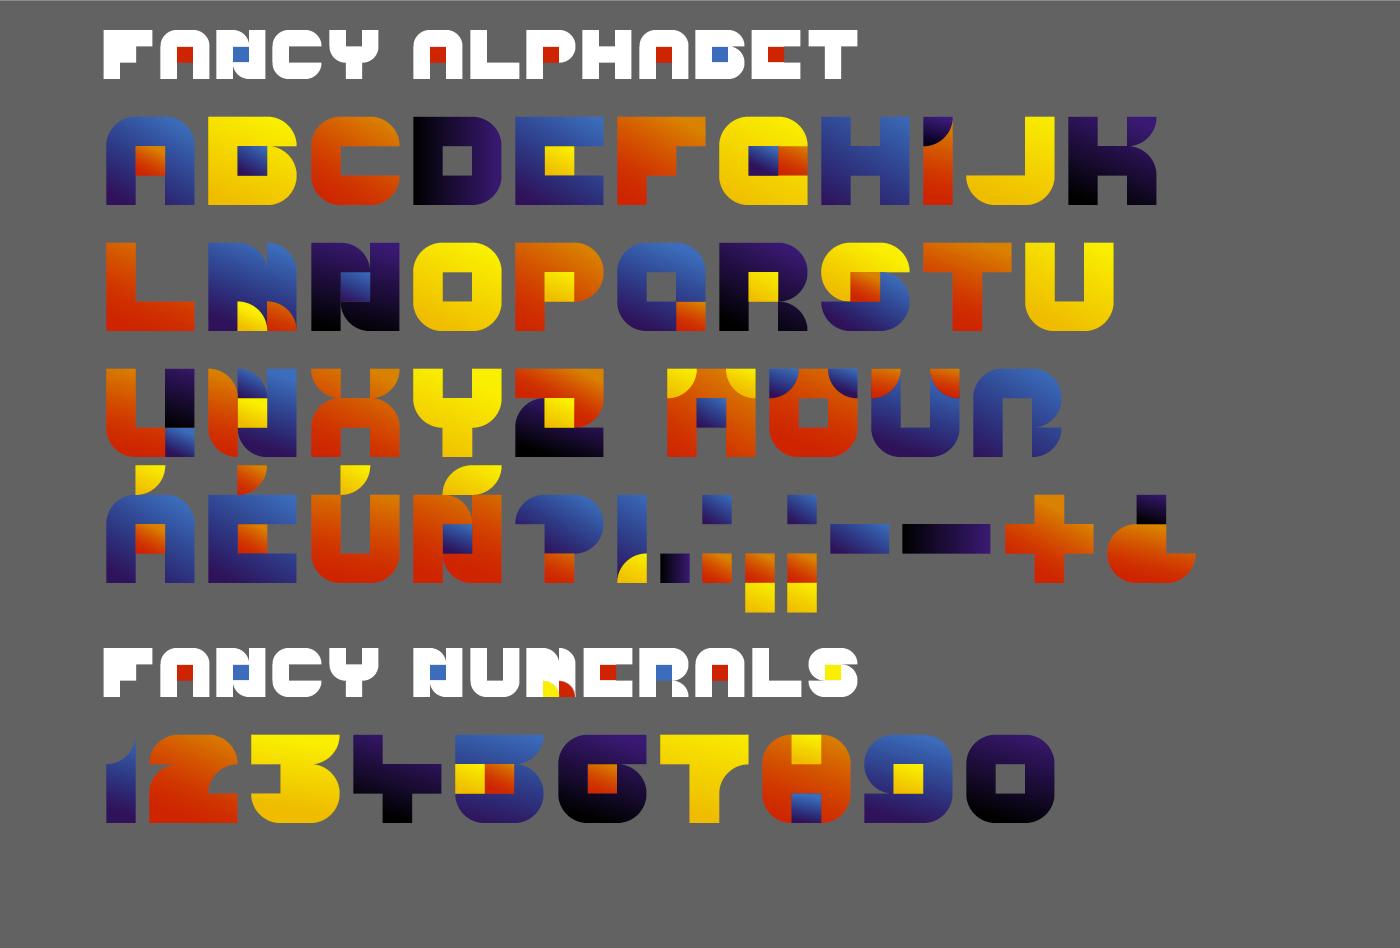 Free font typedesign geometric color font otf svg fontdesign schrift Typeface